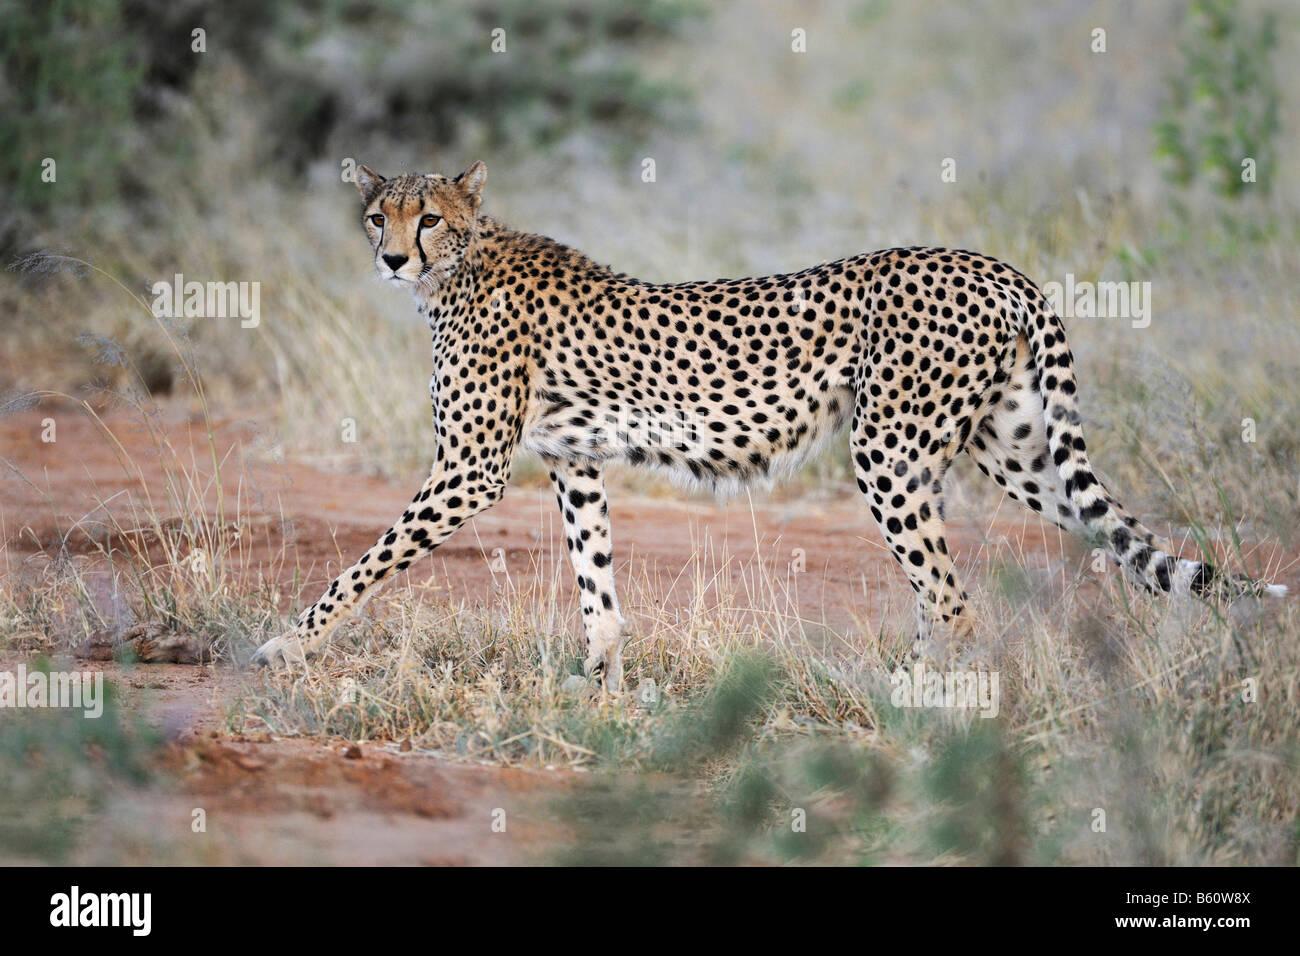 Cheetah (Acinonyx jubatus) at dusk, Samburu National Reserve, Kenya, East Africa, Africa - Stock Image